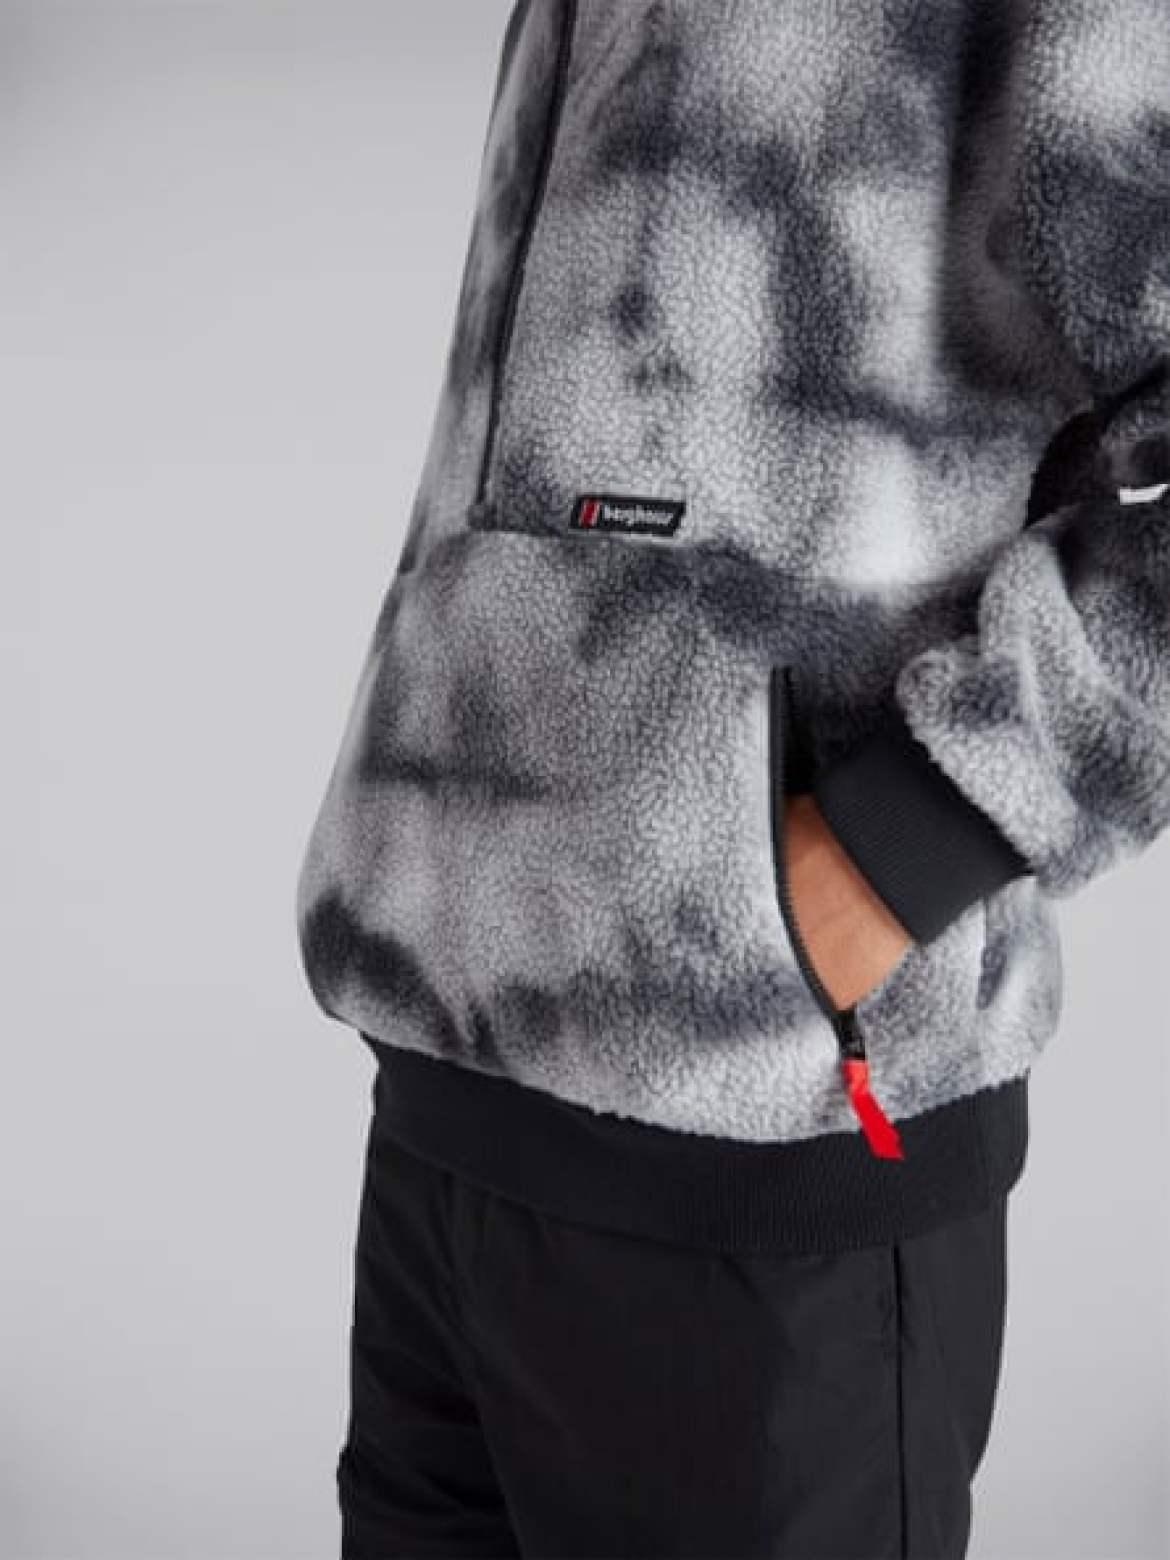 Polar 90 fleece half zip, Berghaus, £52.50